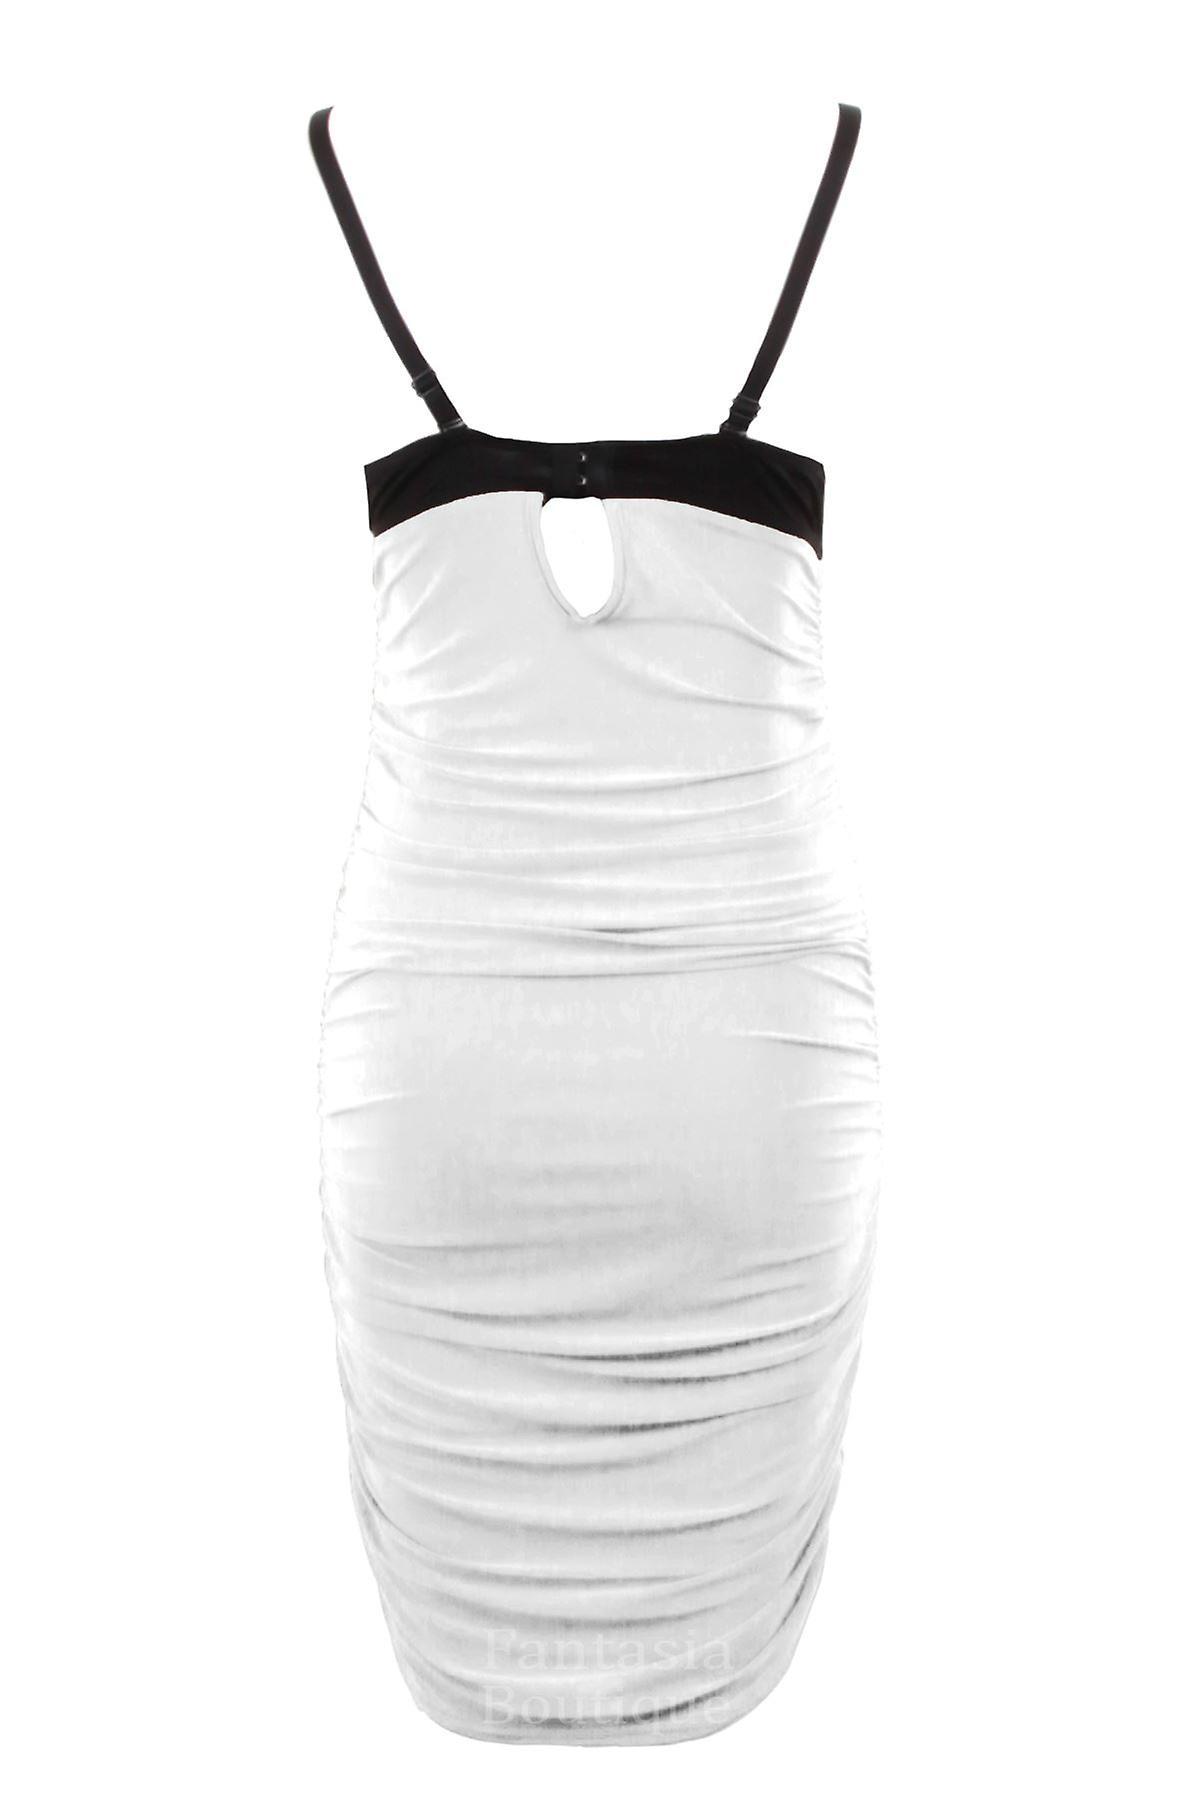 Ladies Spike Studded Padded Bra Strap Black Bodycon Women's Party Dress